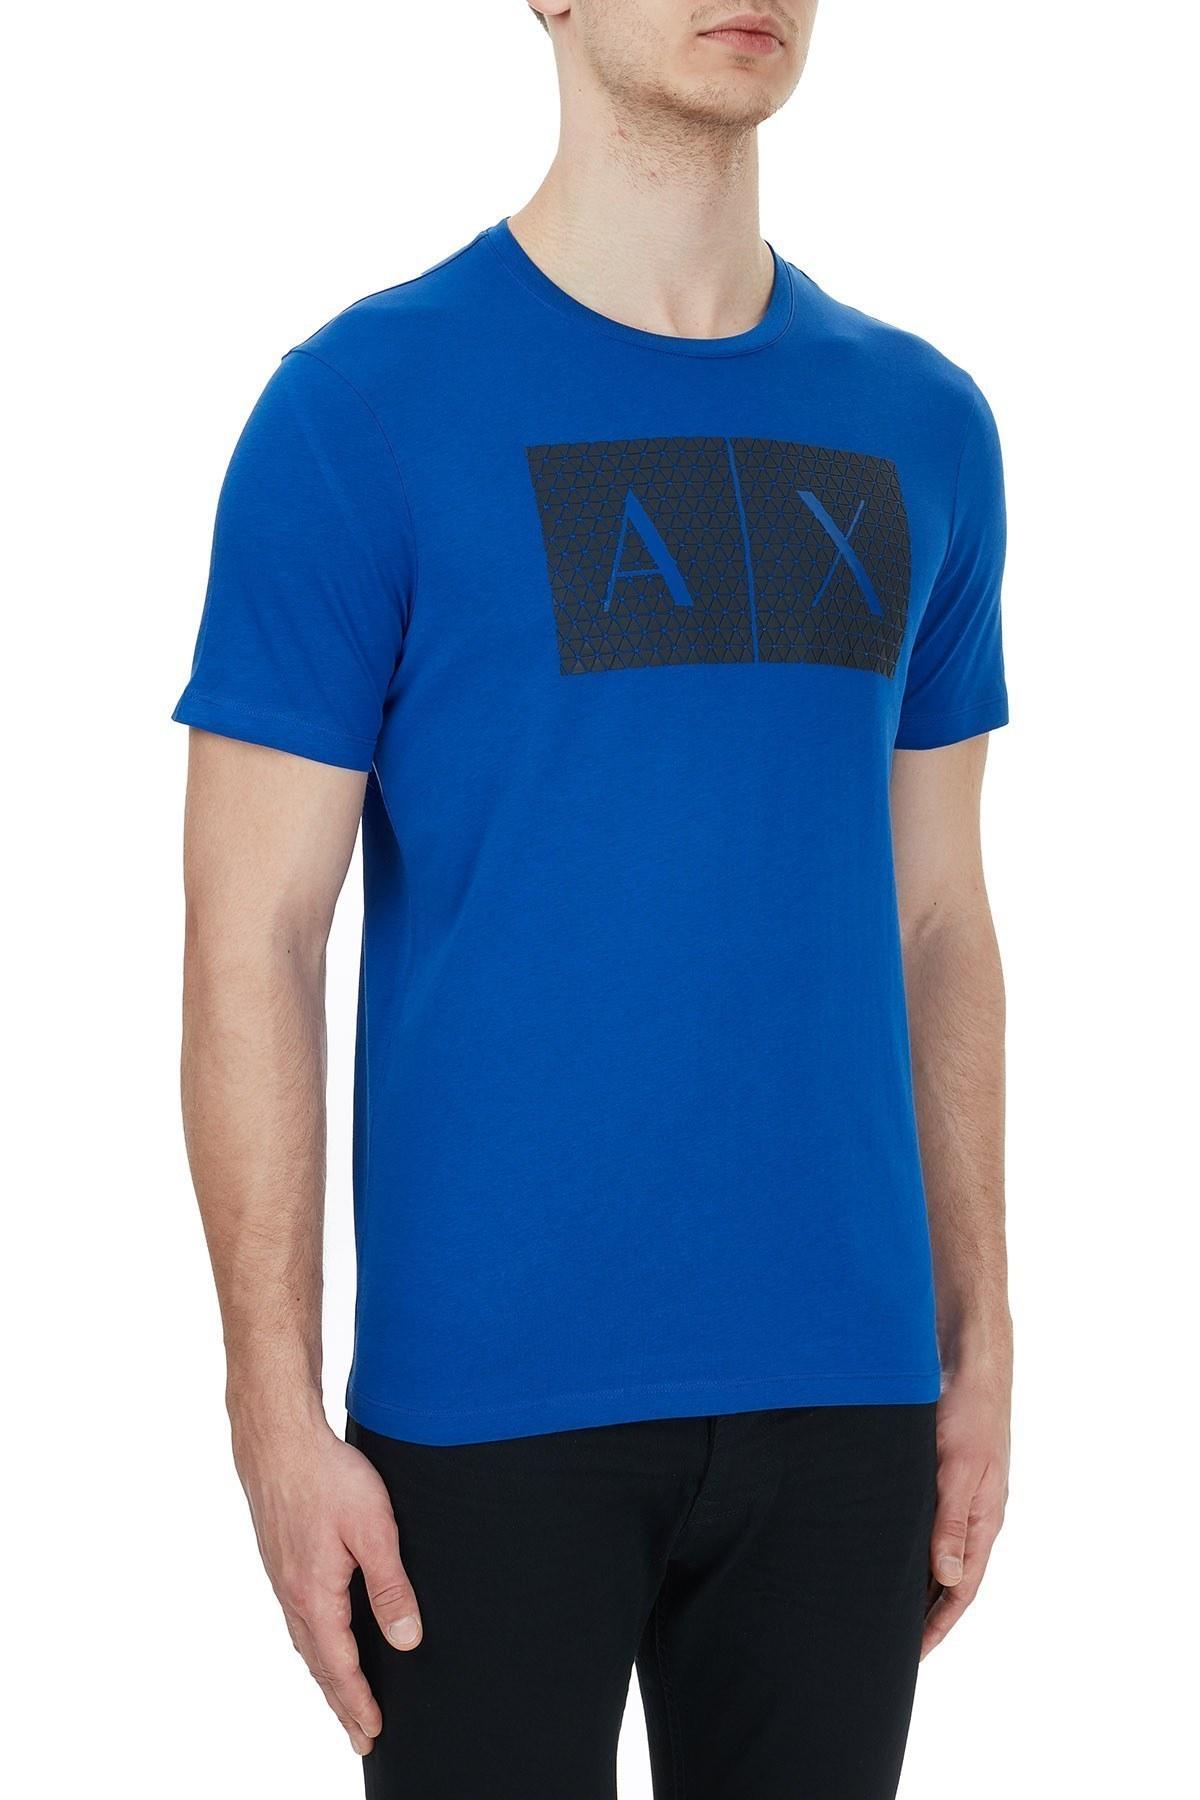 Armani Exchange % 100 Pamuklu Baskılı Bisiklet Yaka Erkek T Shirt 8NZTCK Z8H4Z 1506 SAKS